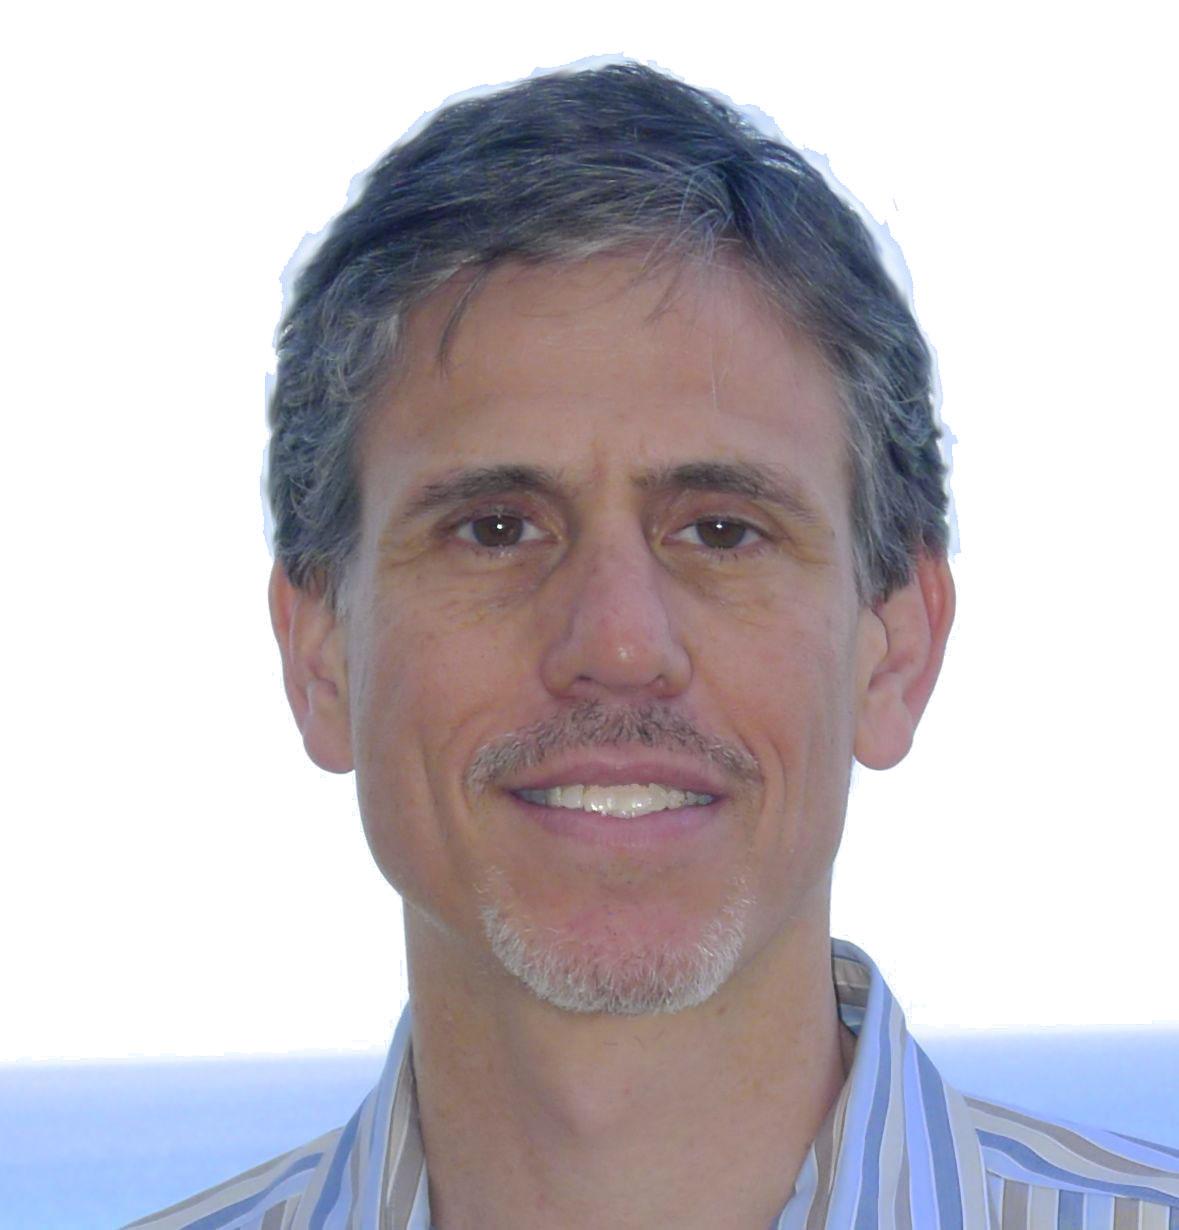 Daniel Brandt